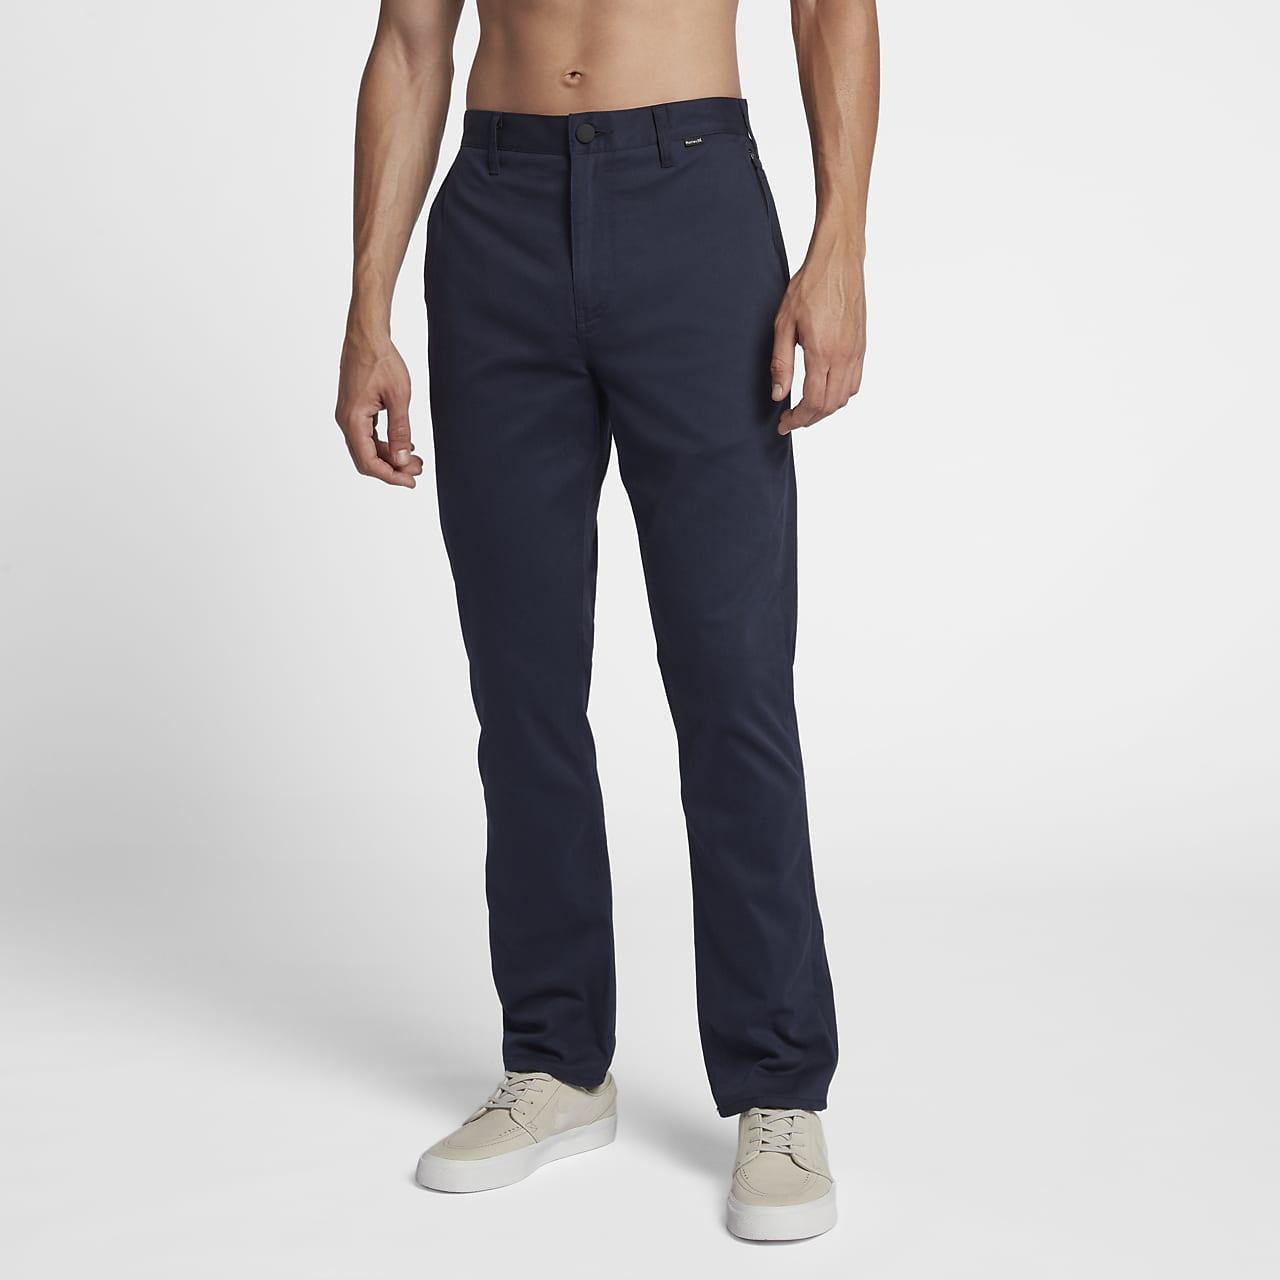 Hurley Dri-FIT Worker Men's Pants